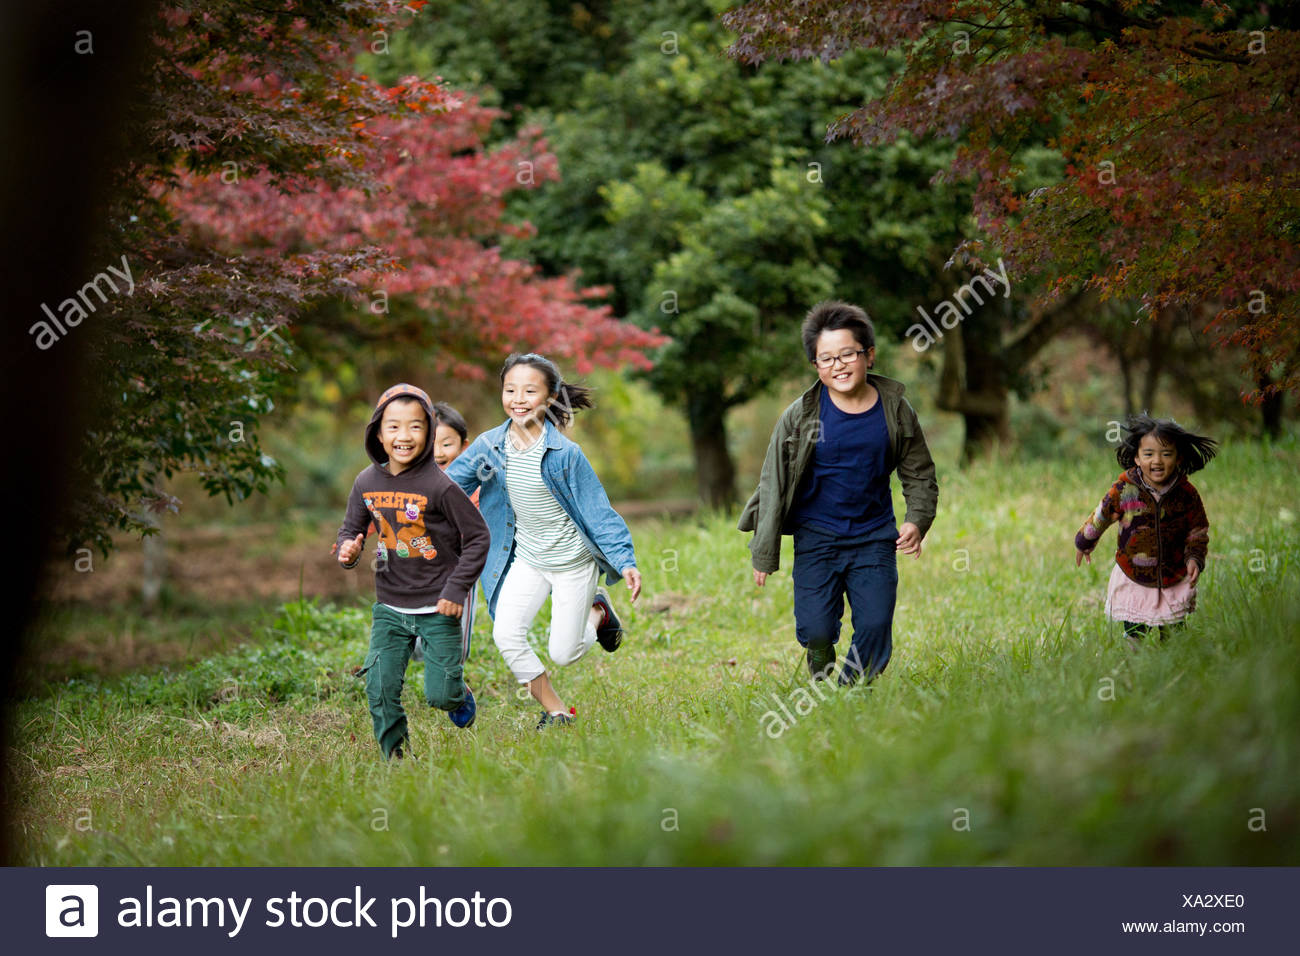 Japanese autumn foliage and children - Stock Image